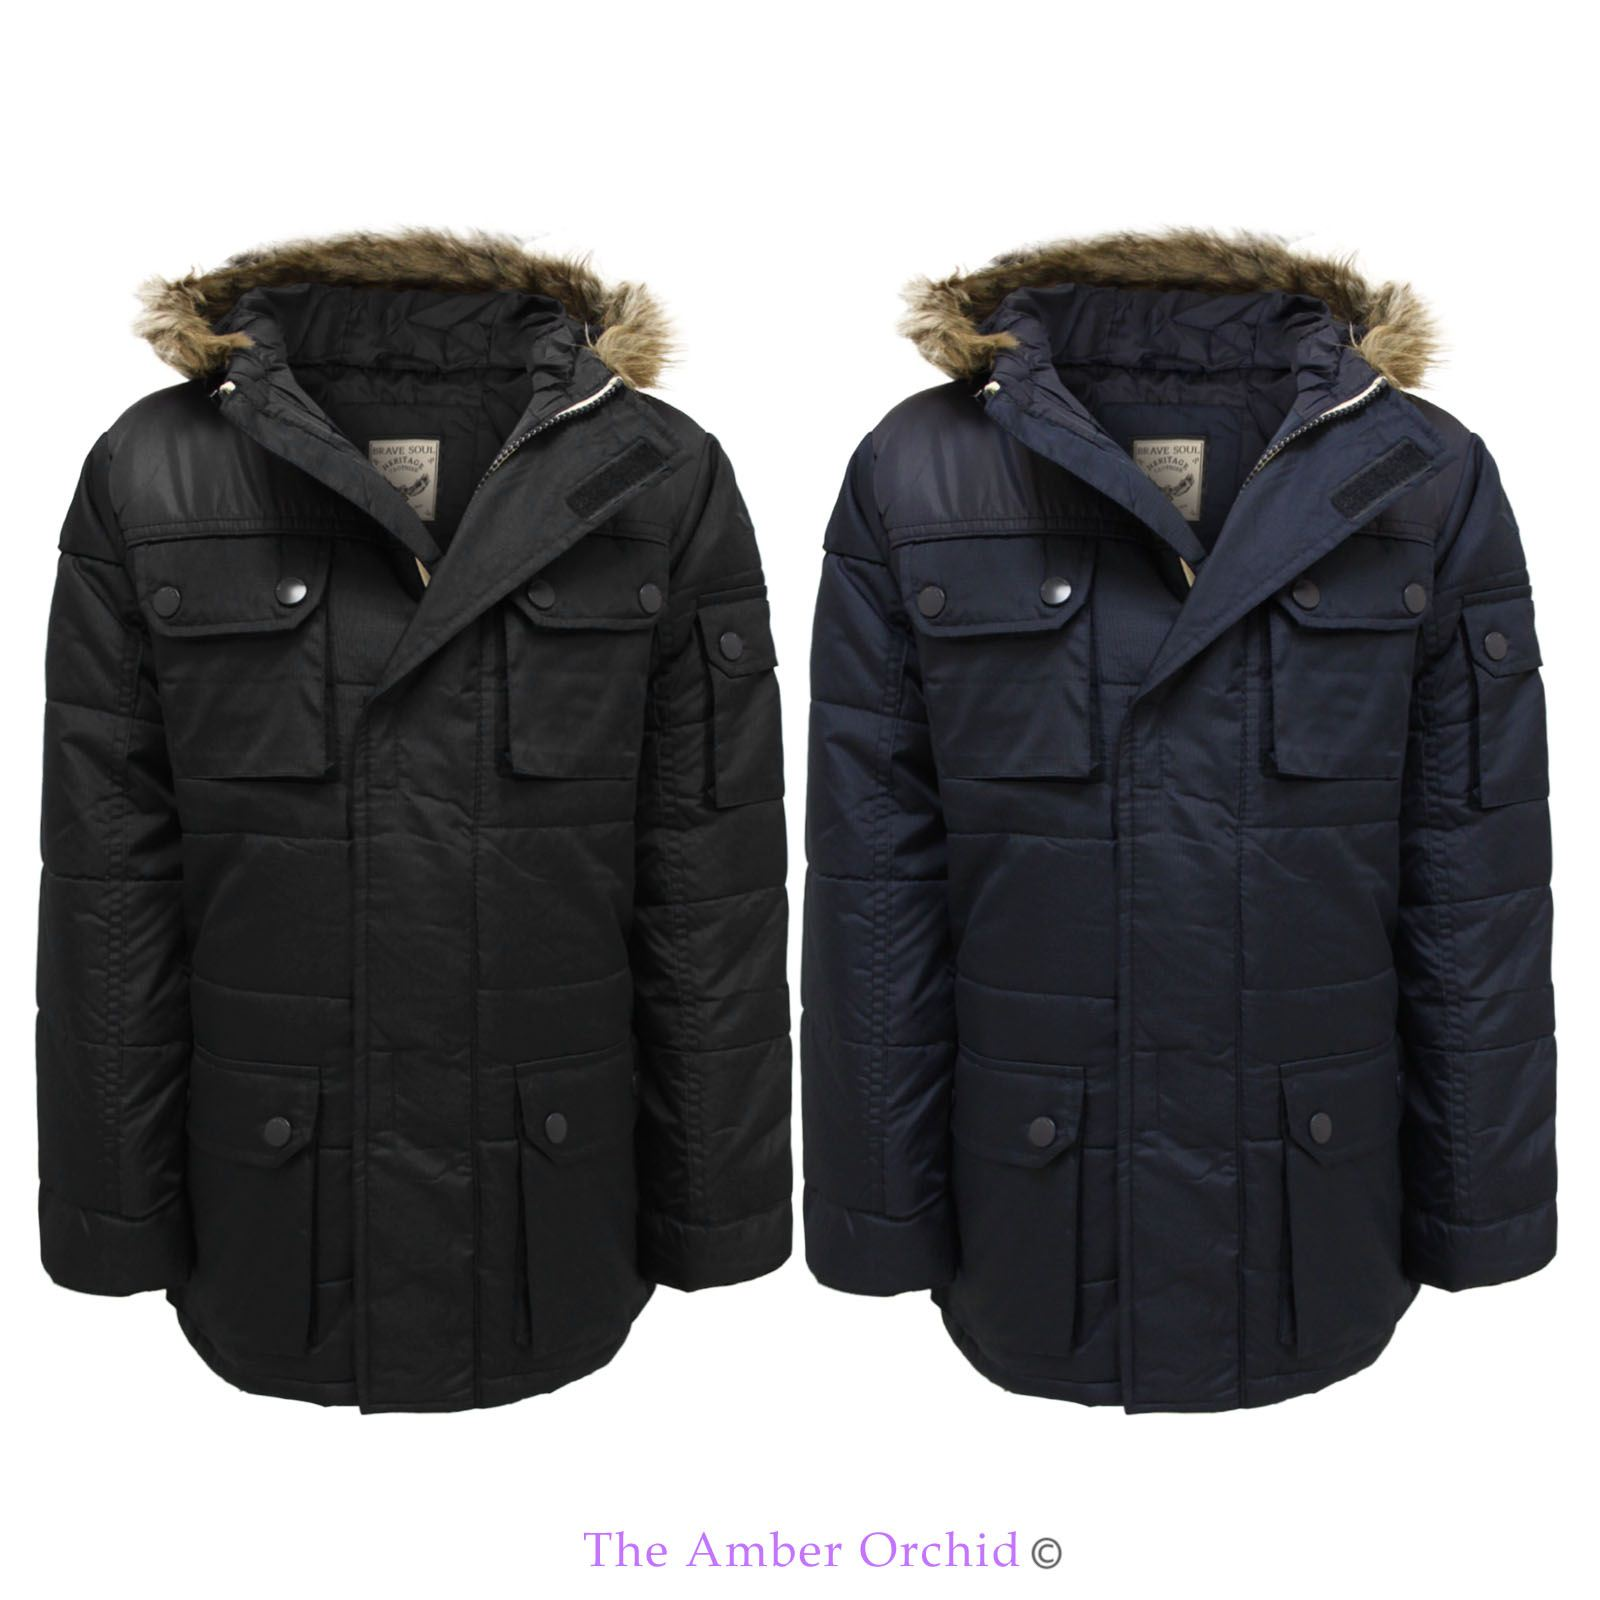 brave soul boys back to school parka jacket fur hooded winter kids